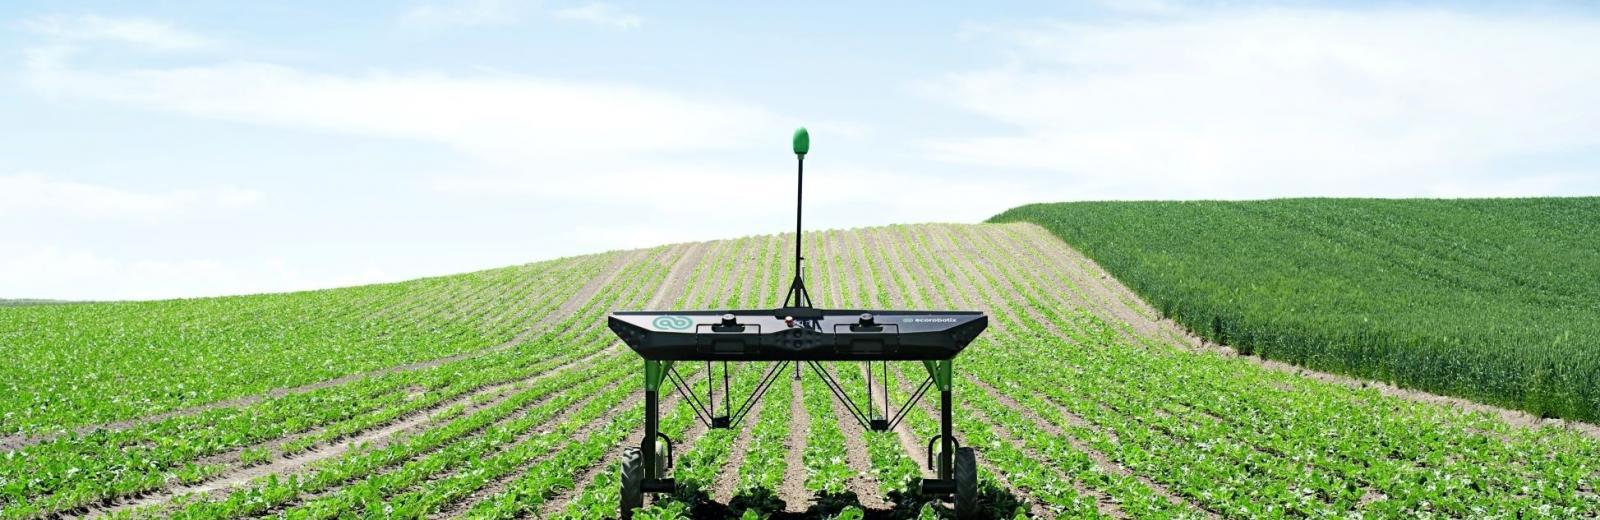 WeedElec – Robotic Agriculture